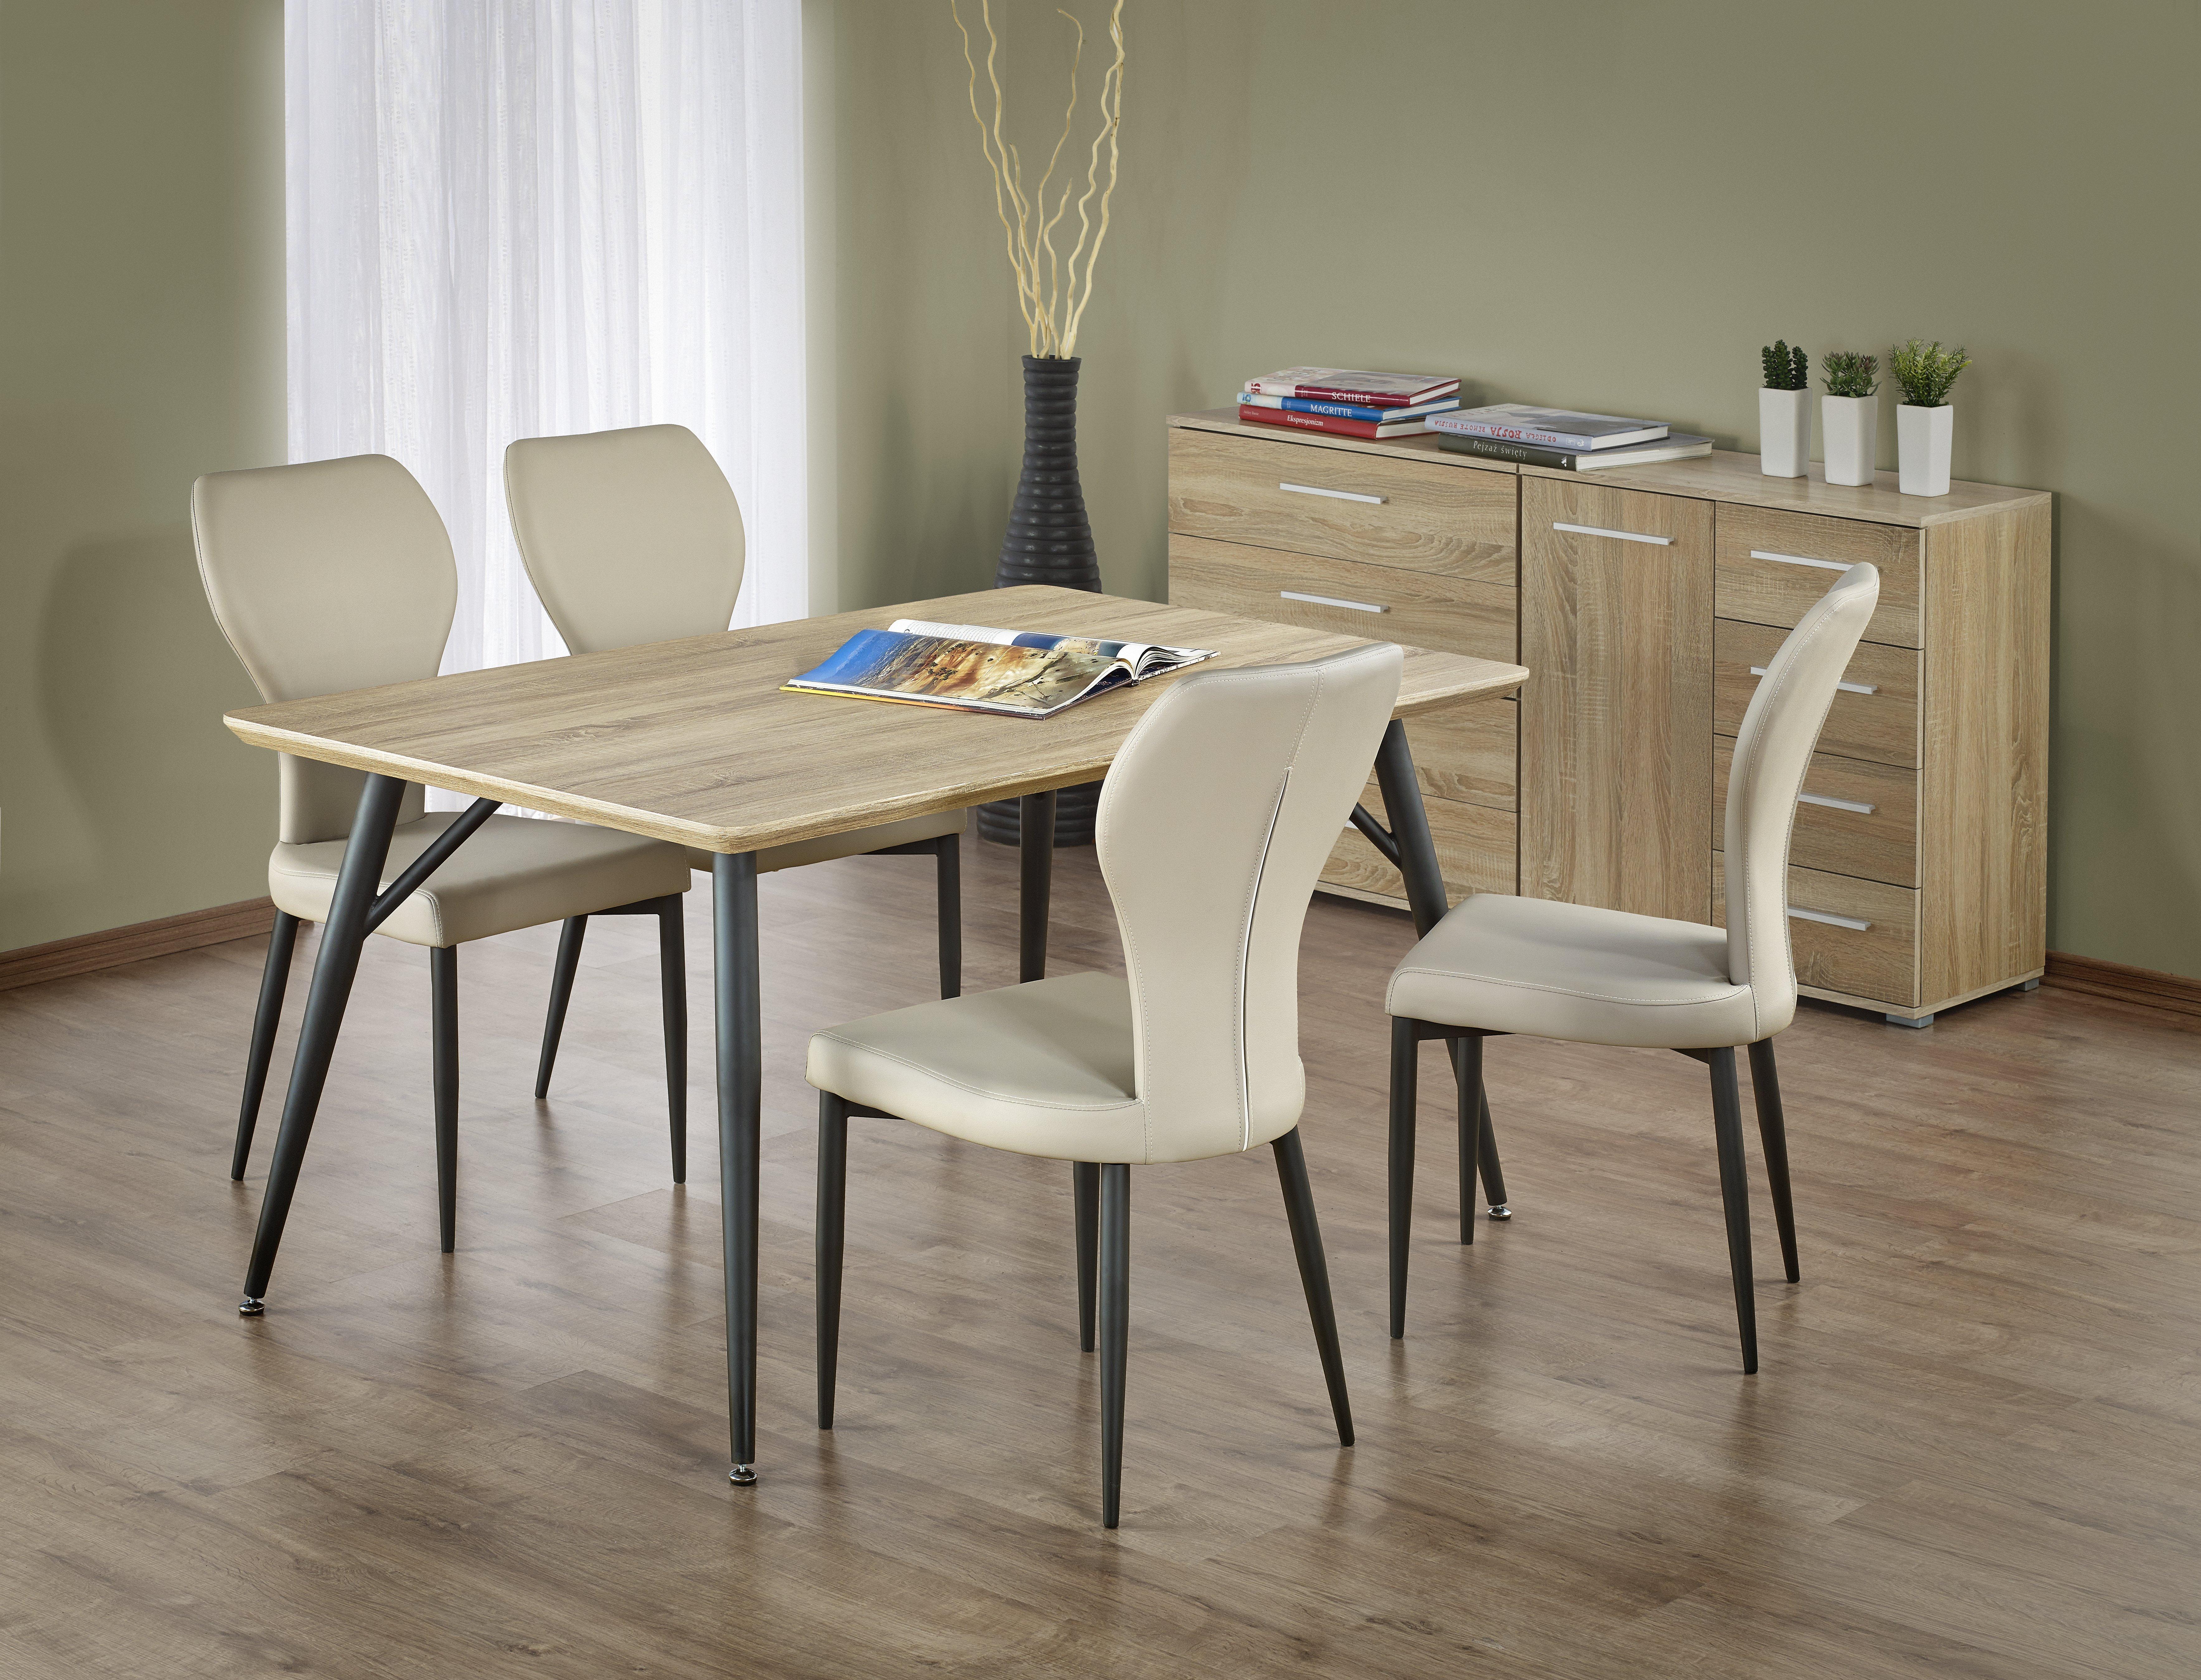 Jídelní stůl - Halmar - Fabio (pro 6 osob)